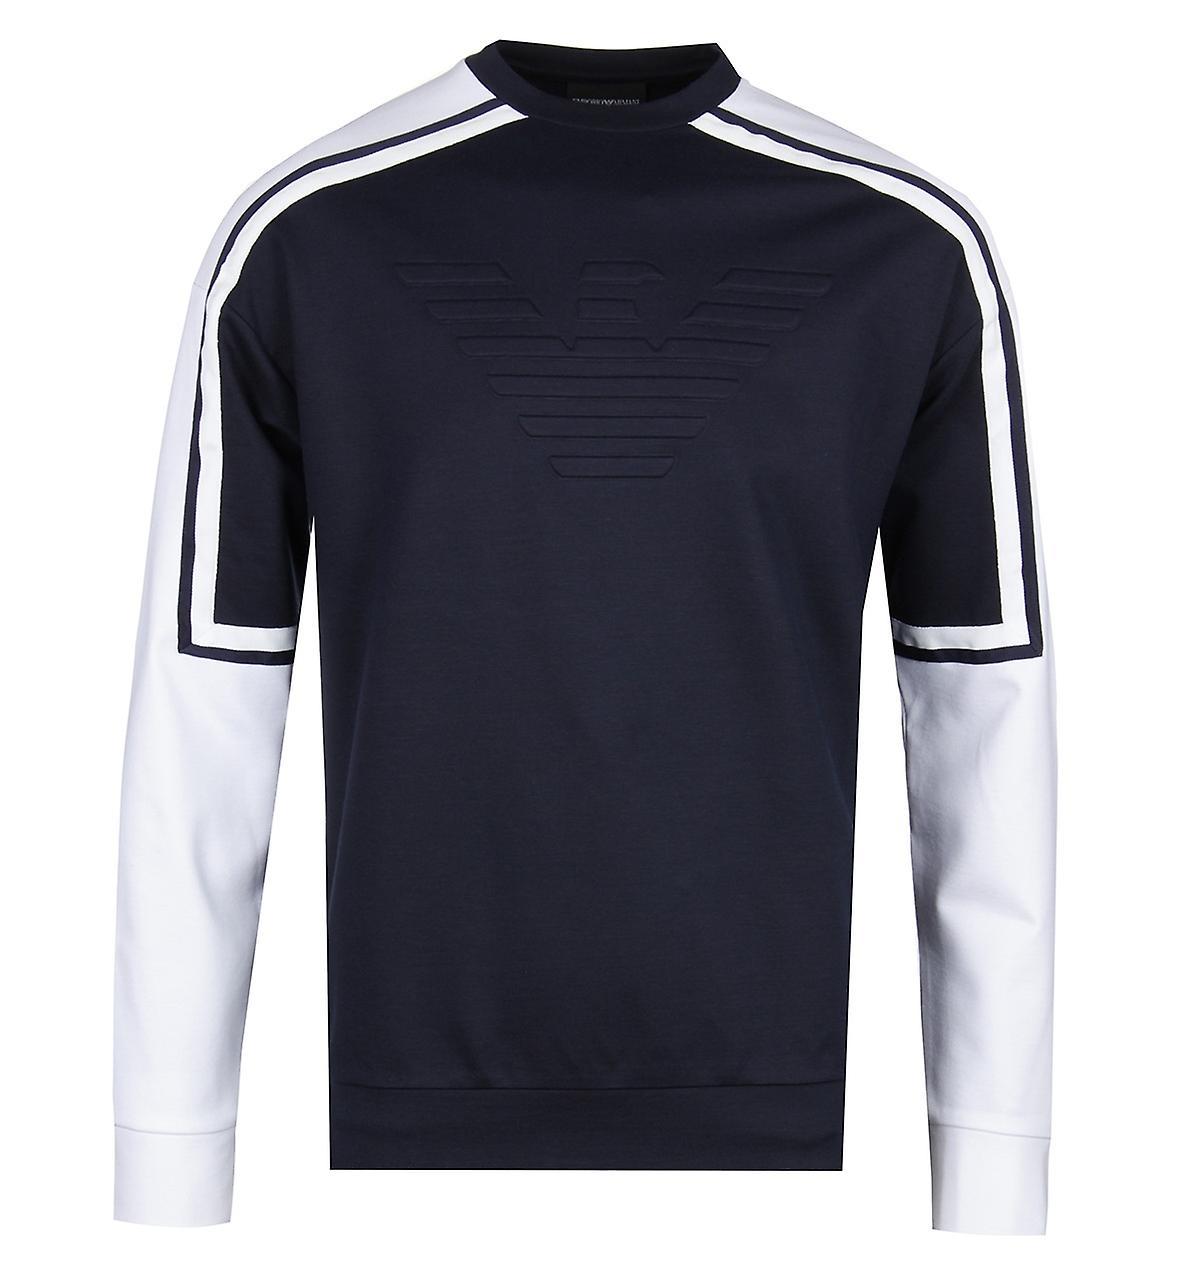 Emporio Arhommei Raglan Sleeve Navy & blanc Sweatshirt